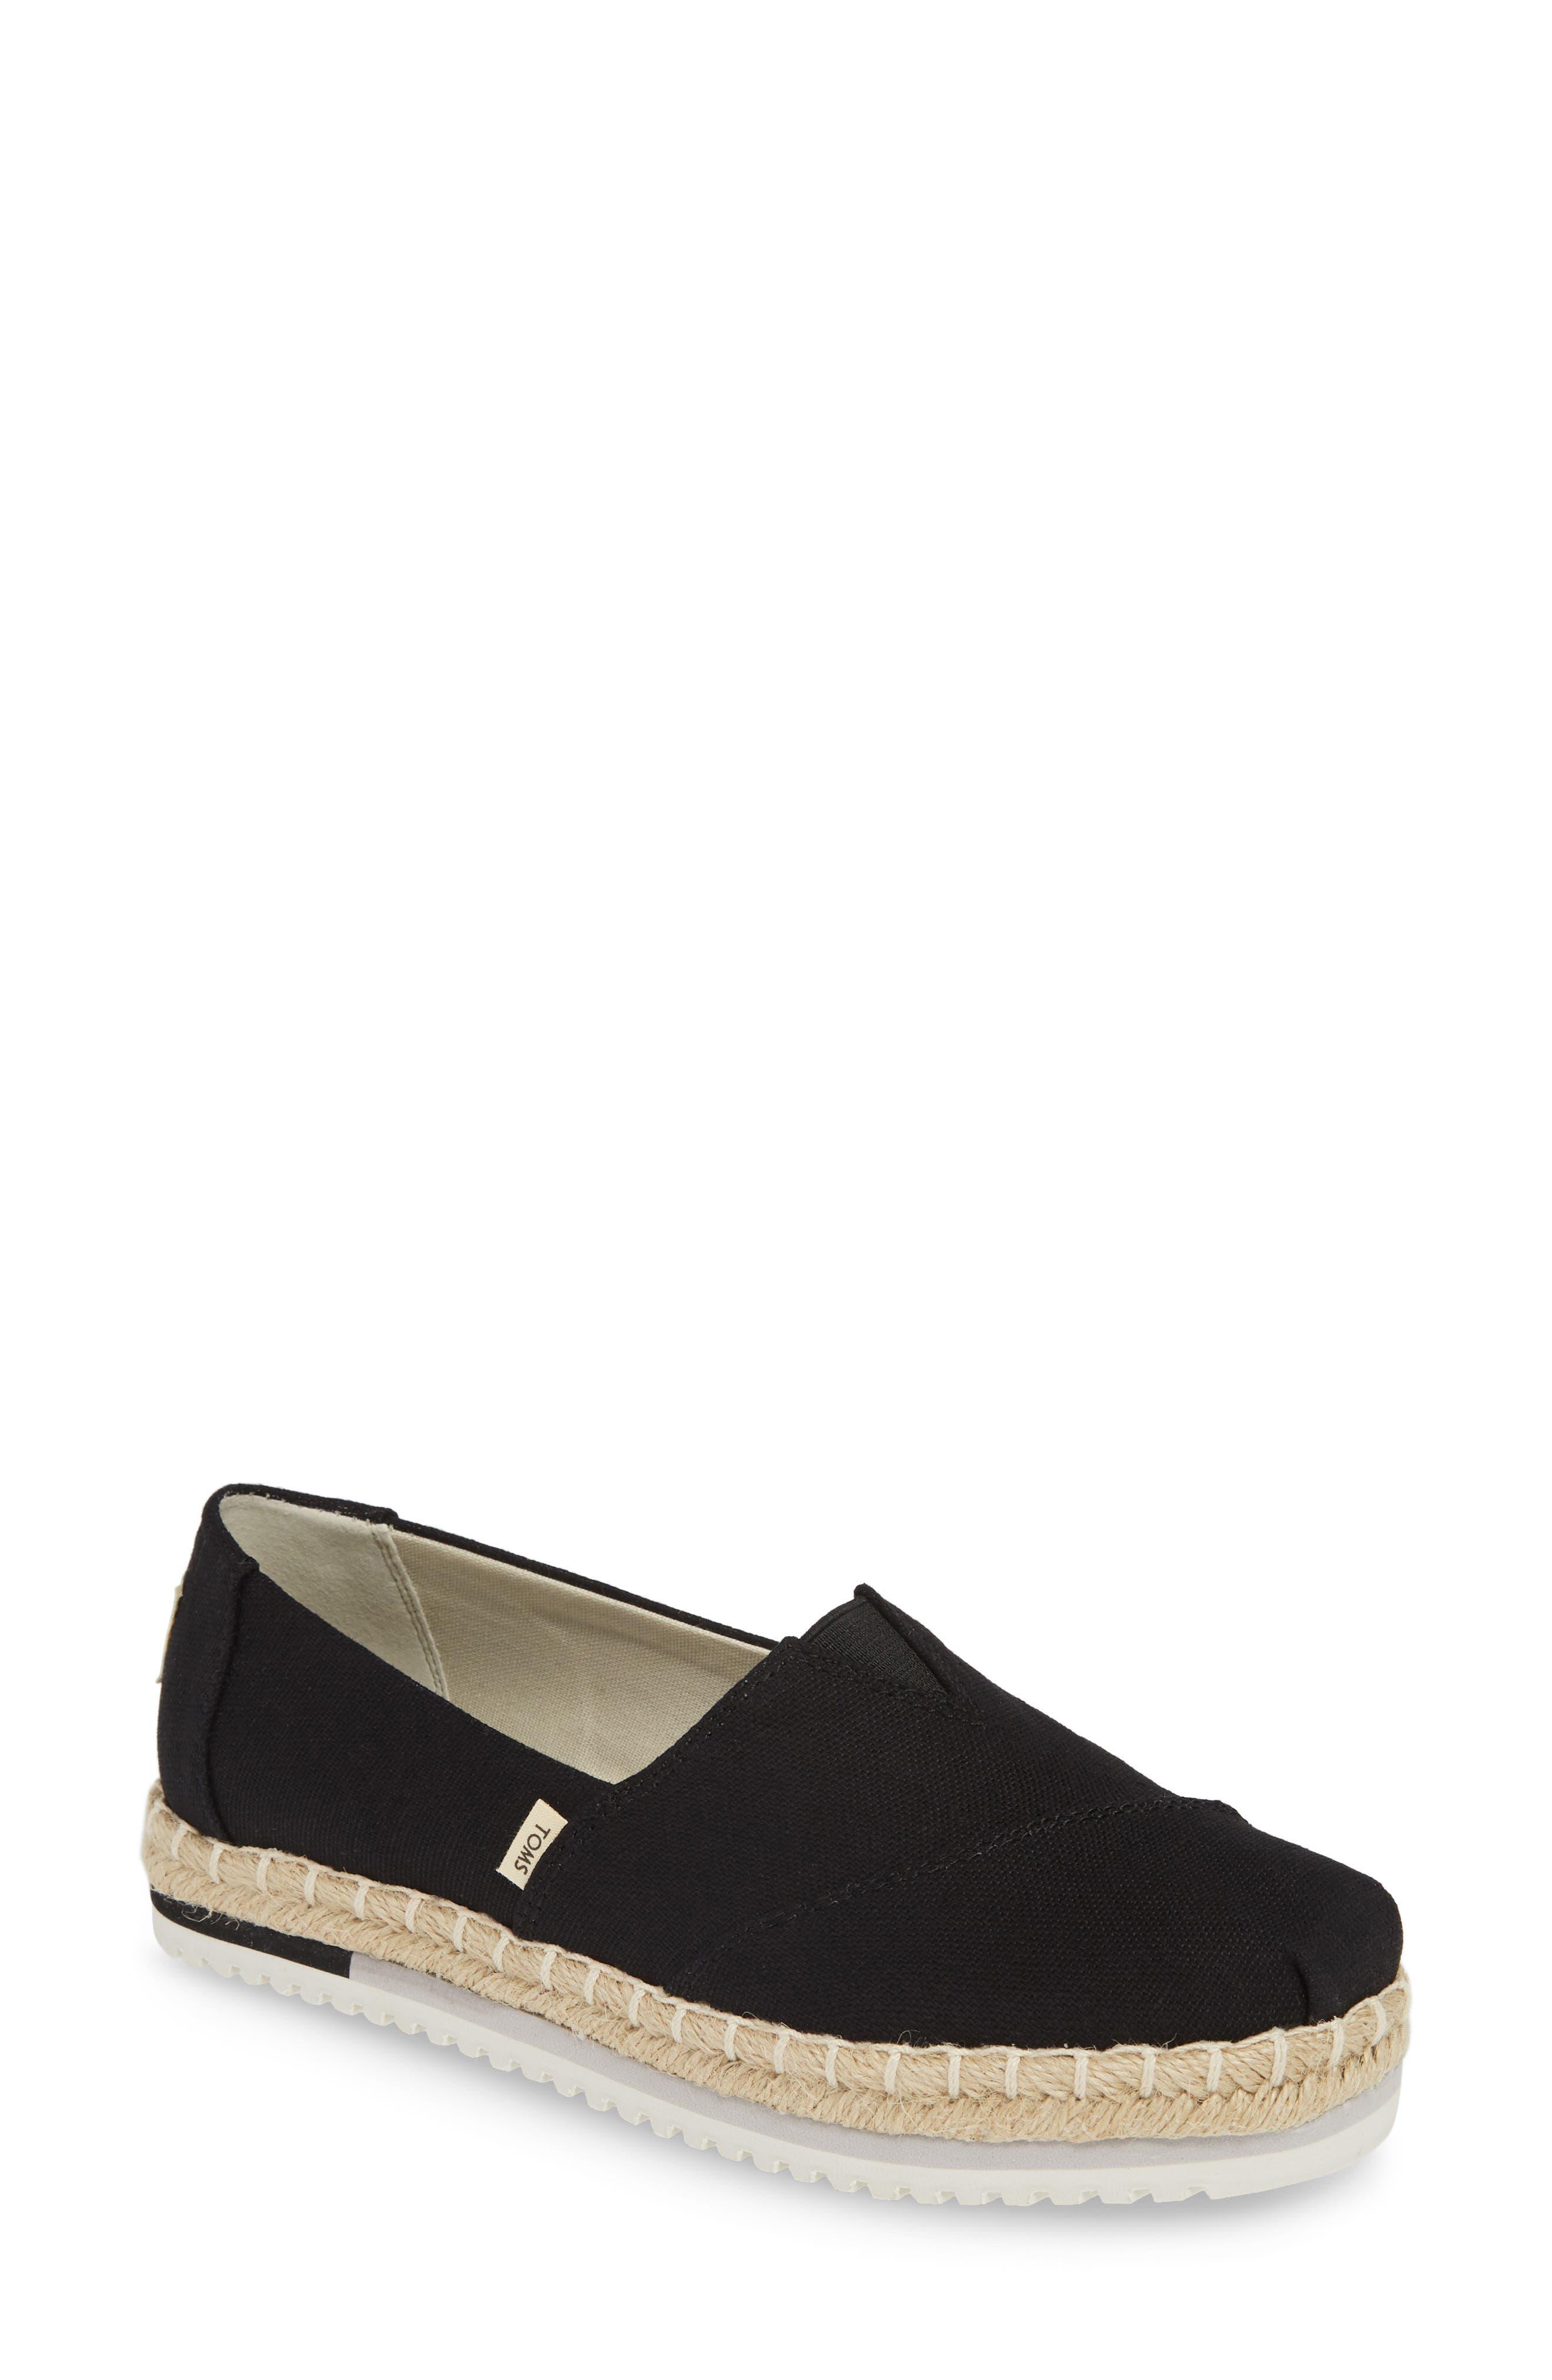 Toms Alpargata Platform Sneaker, Black